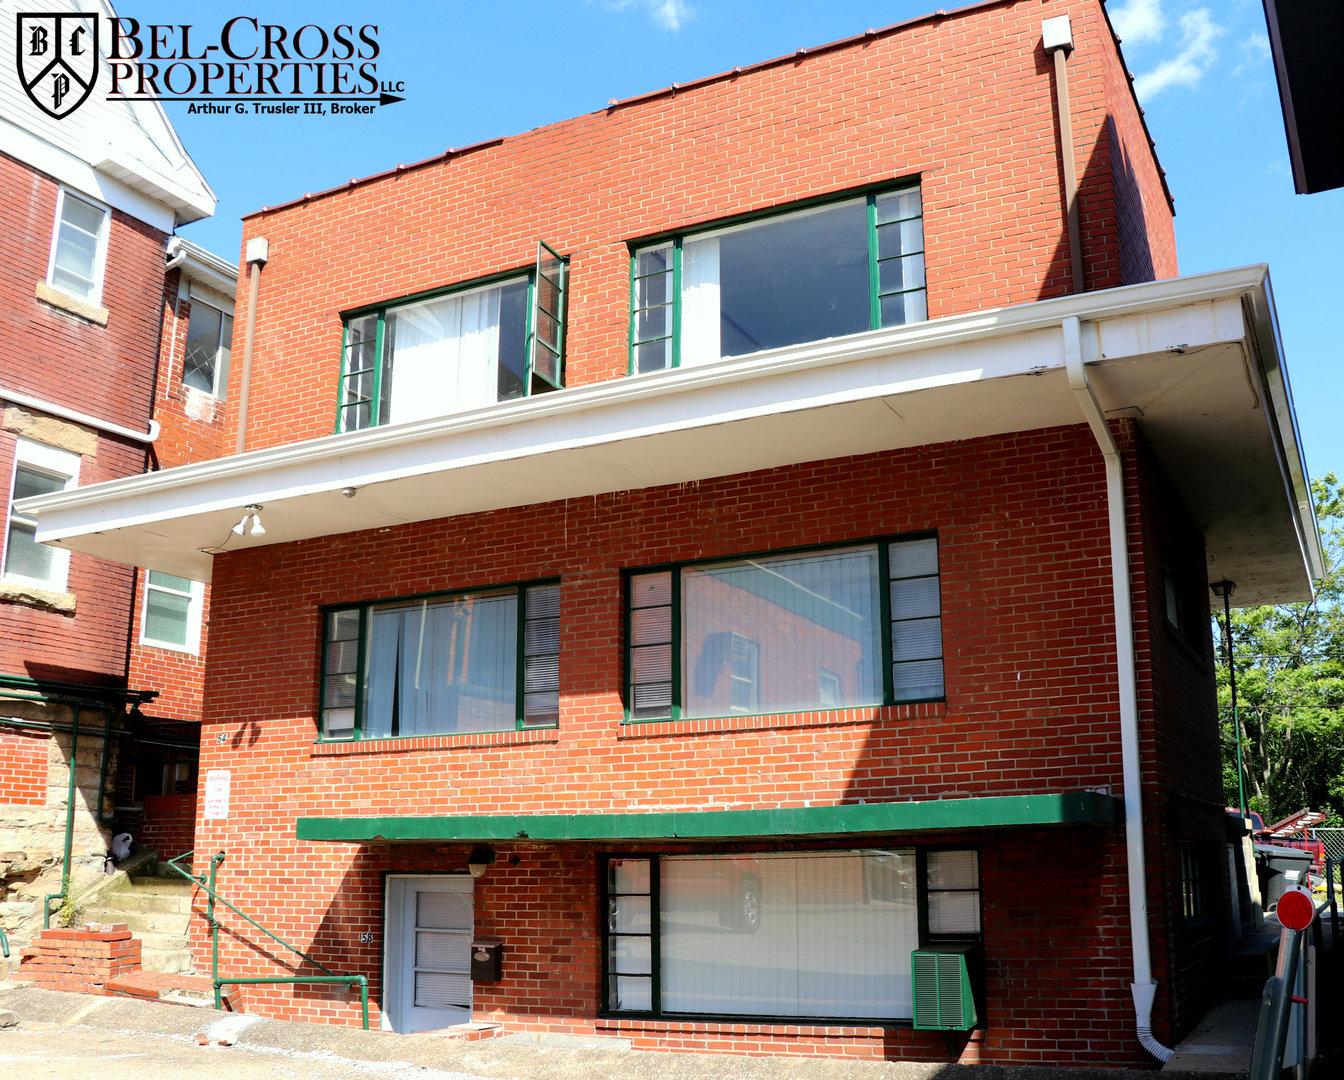 Homes & Apartments for Rent in Morgantown, WV   Bel-Cross